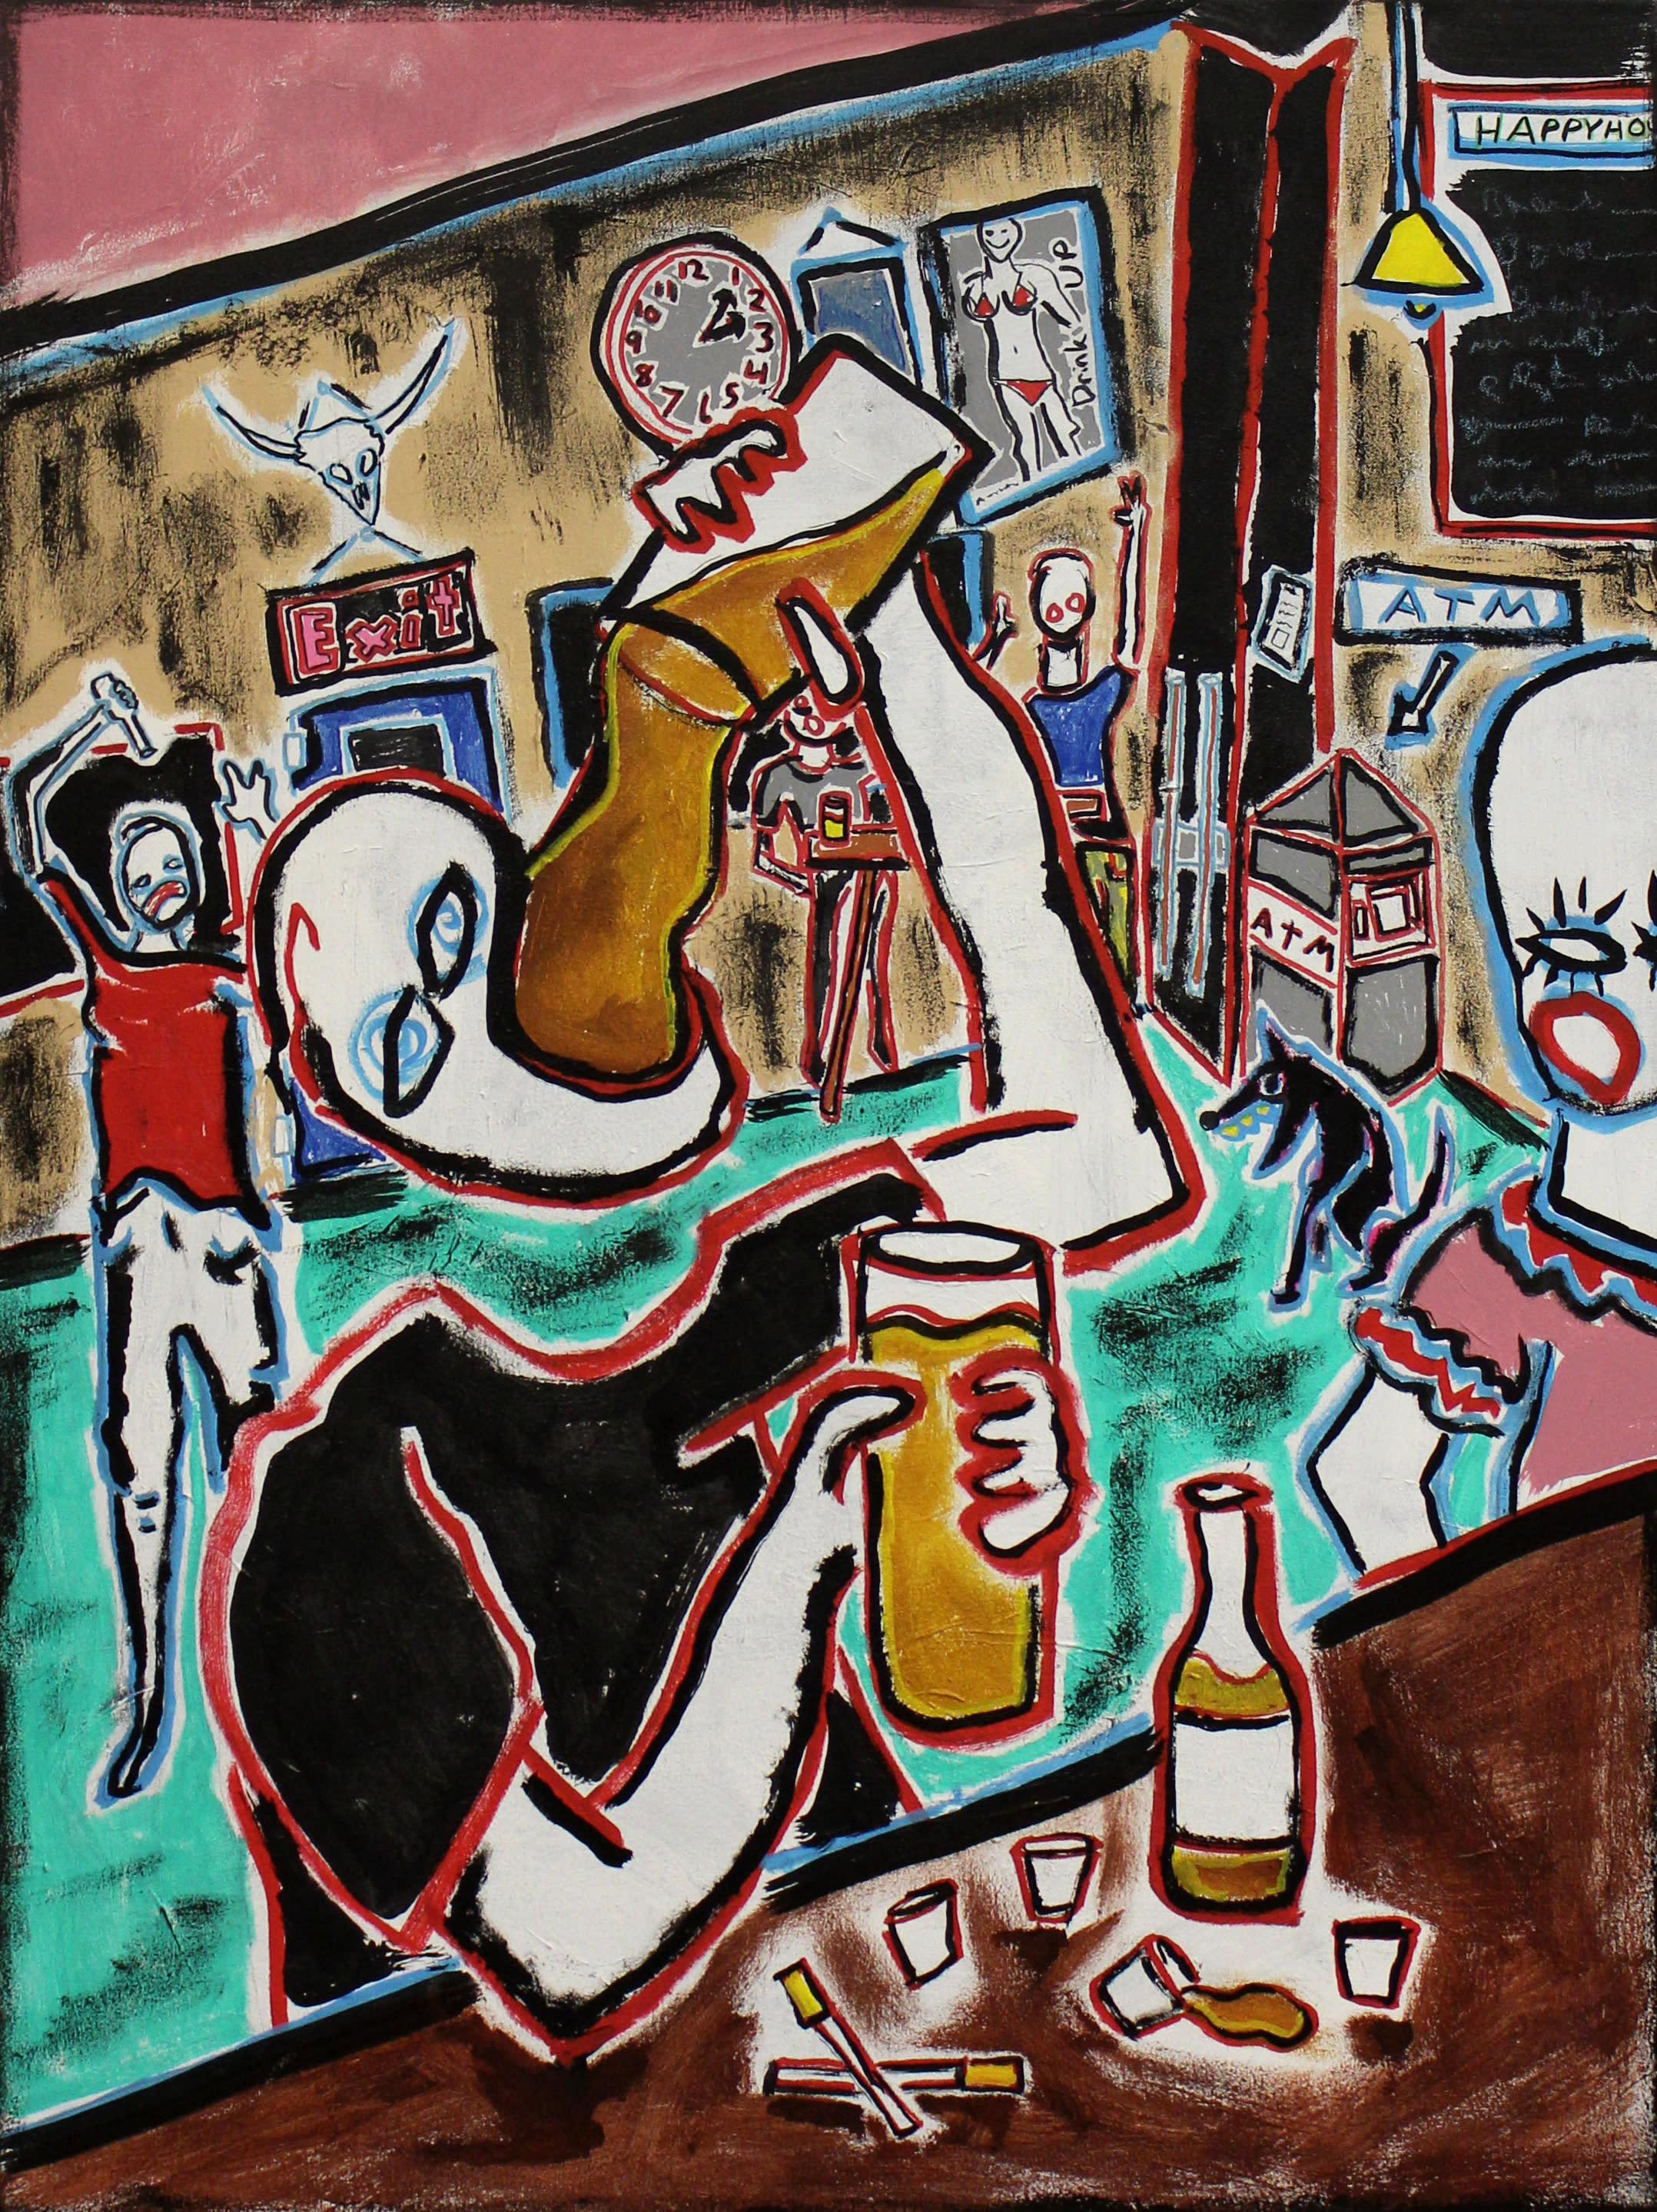 Bar painting paul wylenczek wetpaintnyc gallery r0jqxc